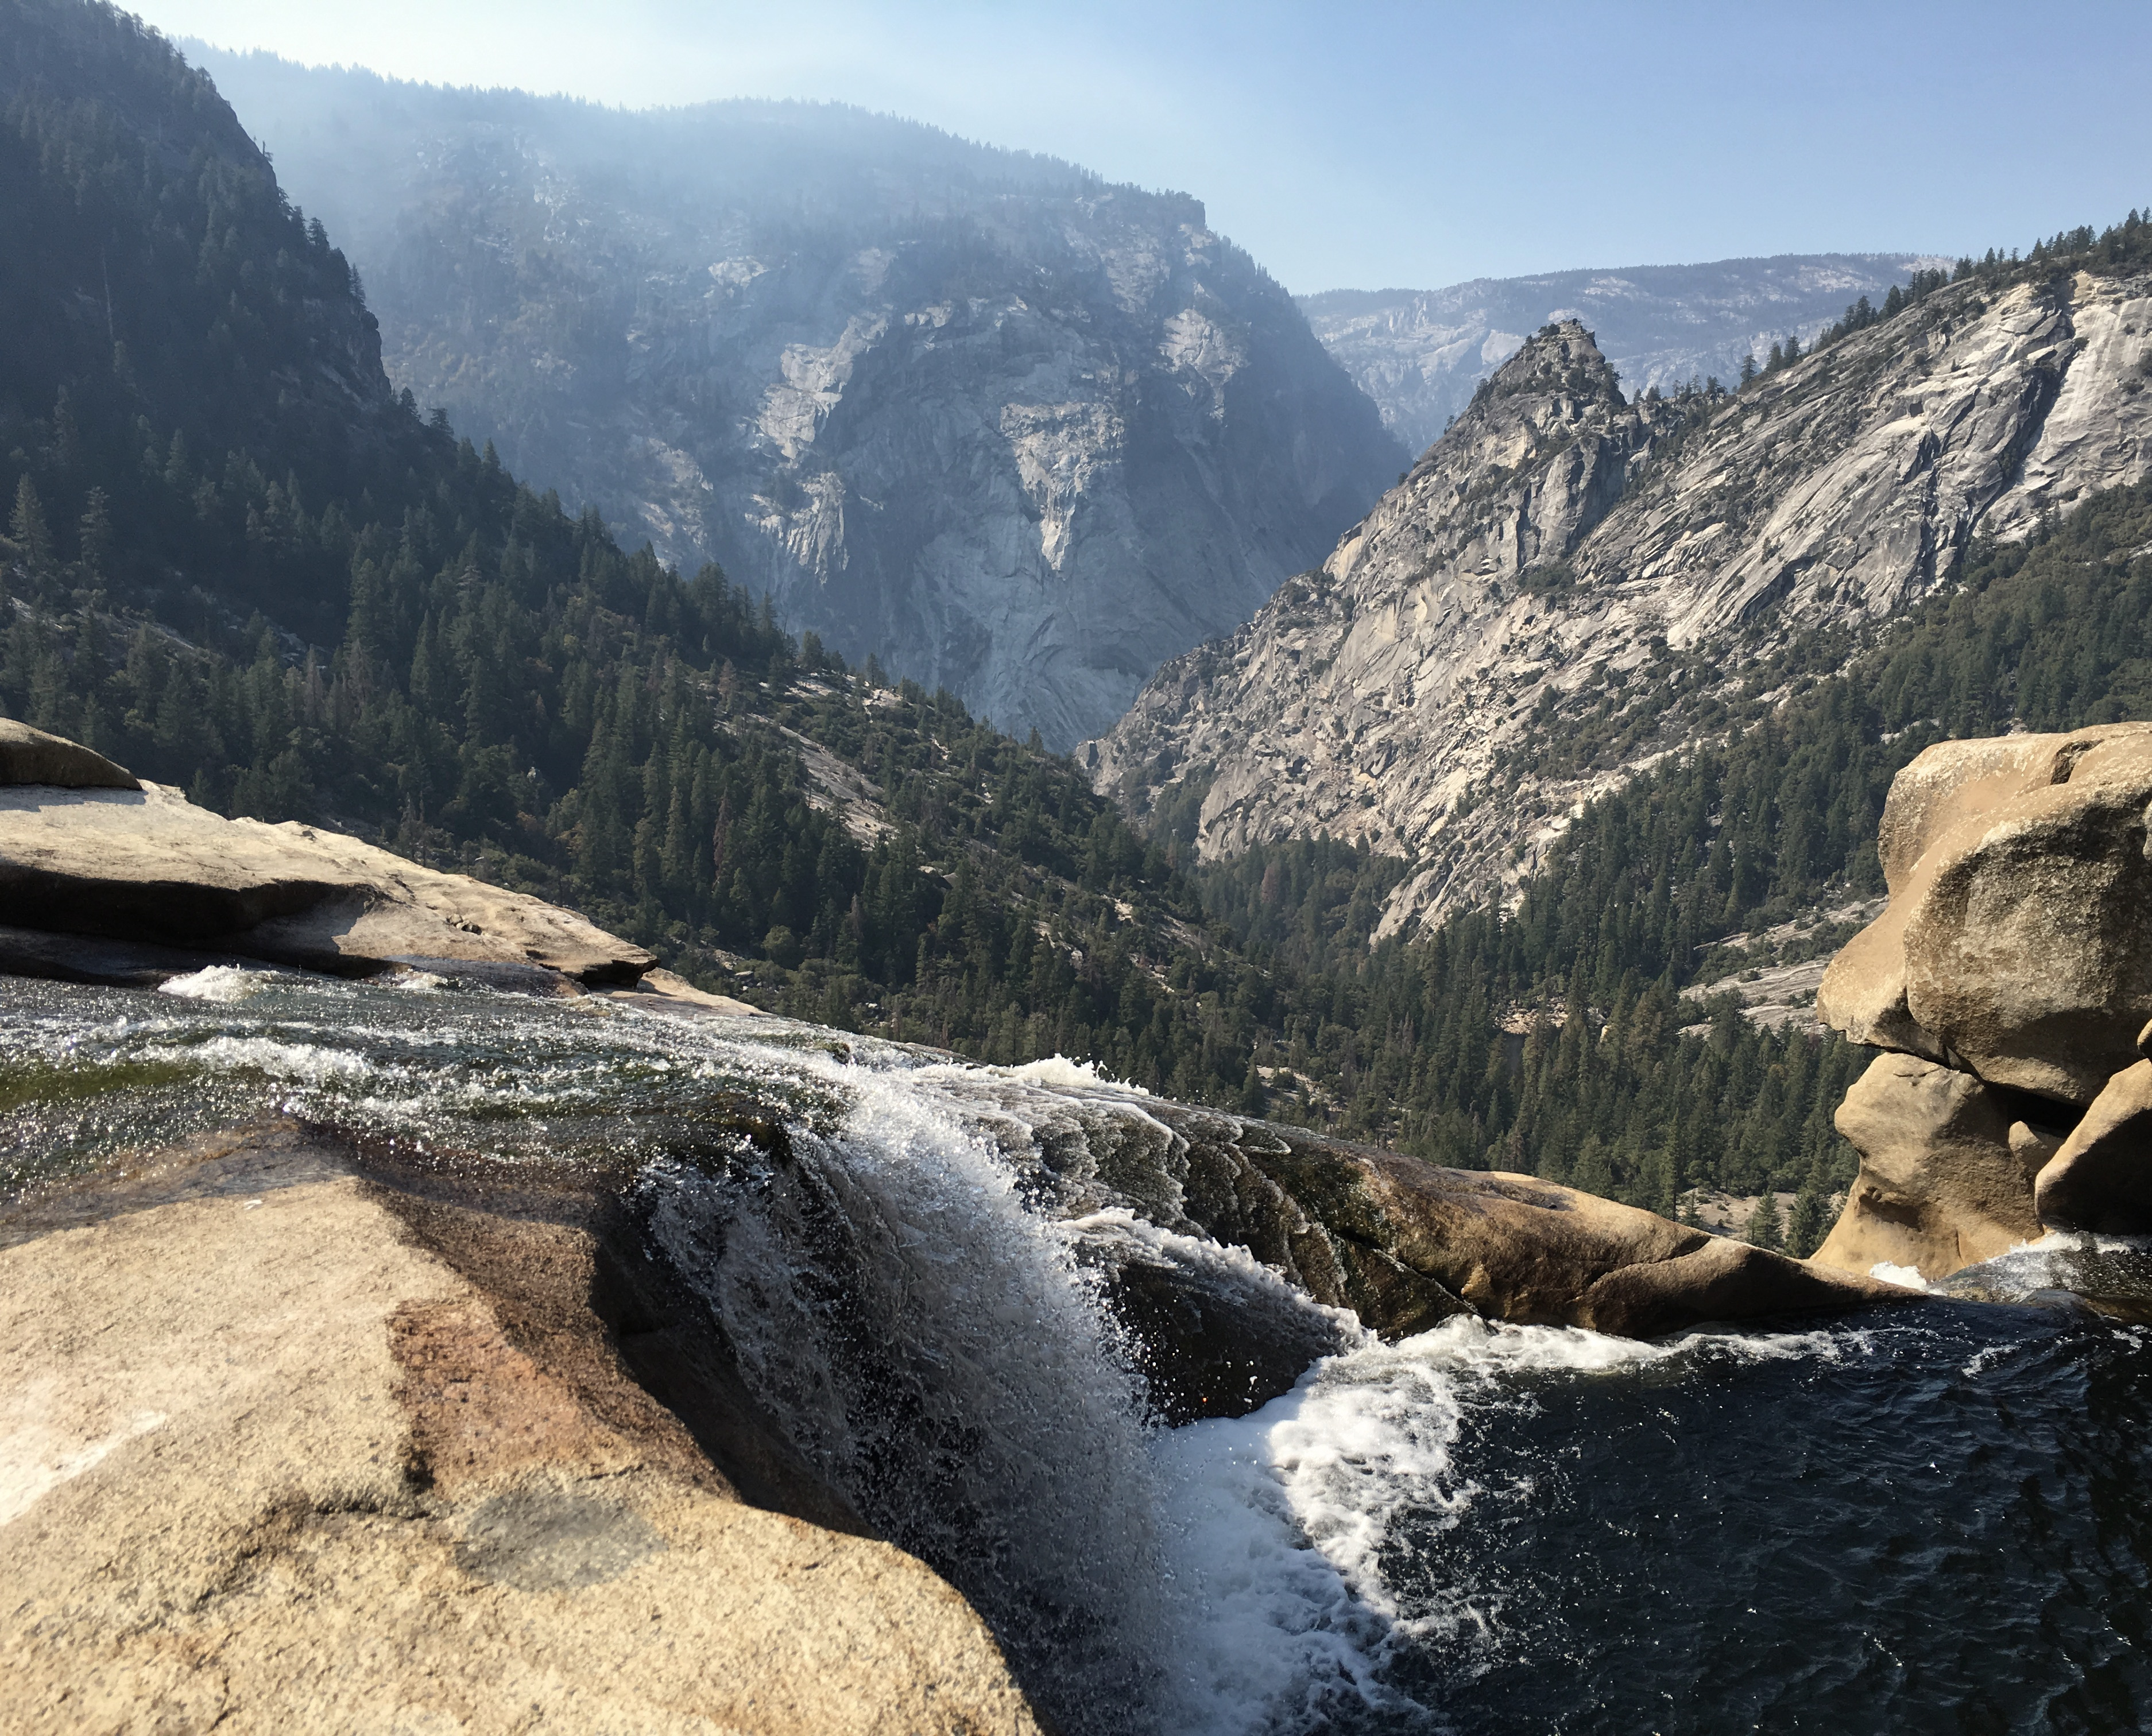 Water flow photo